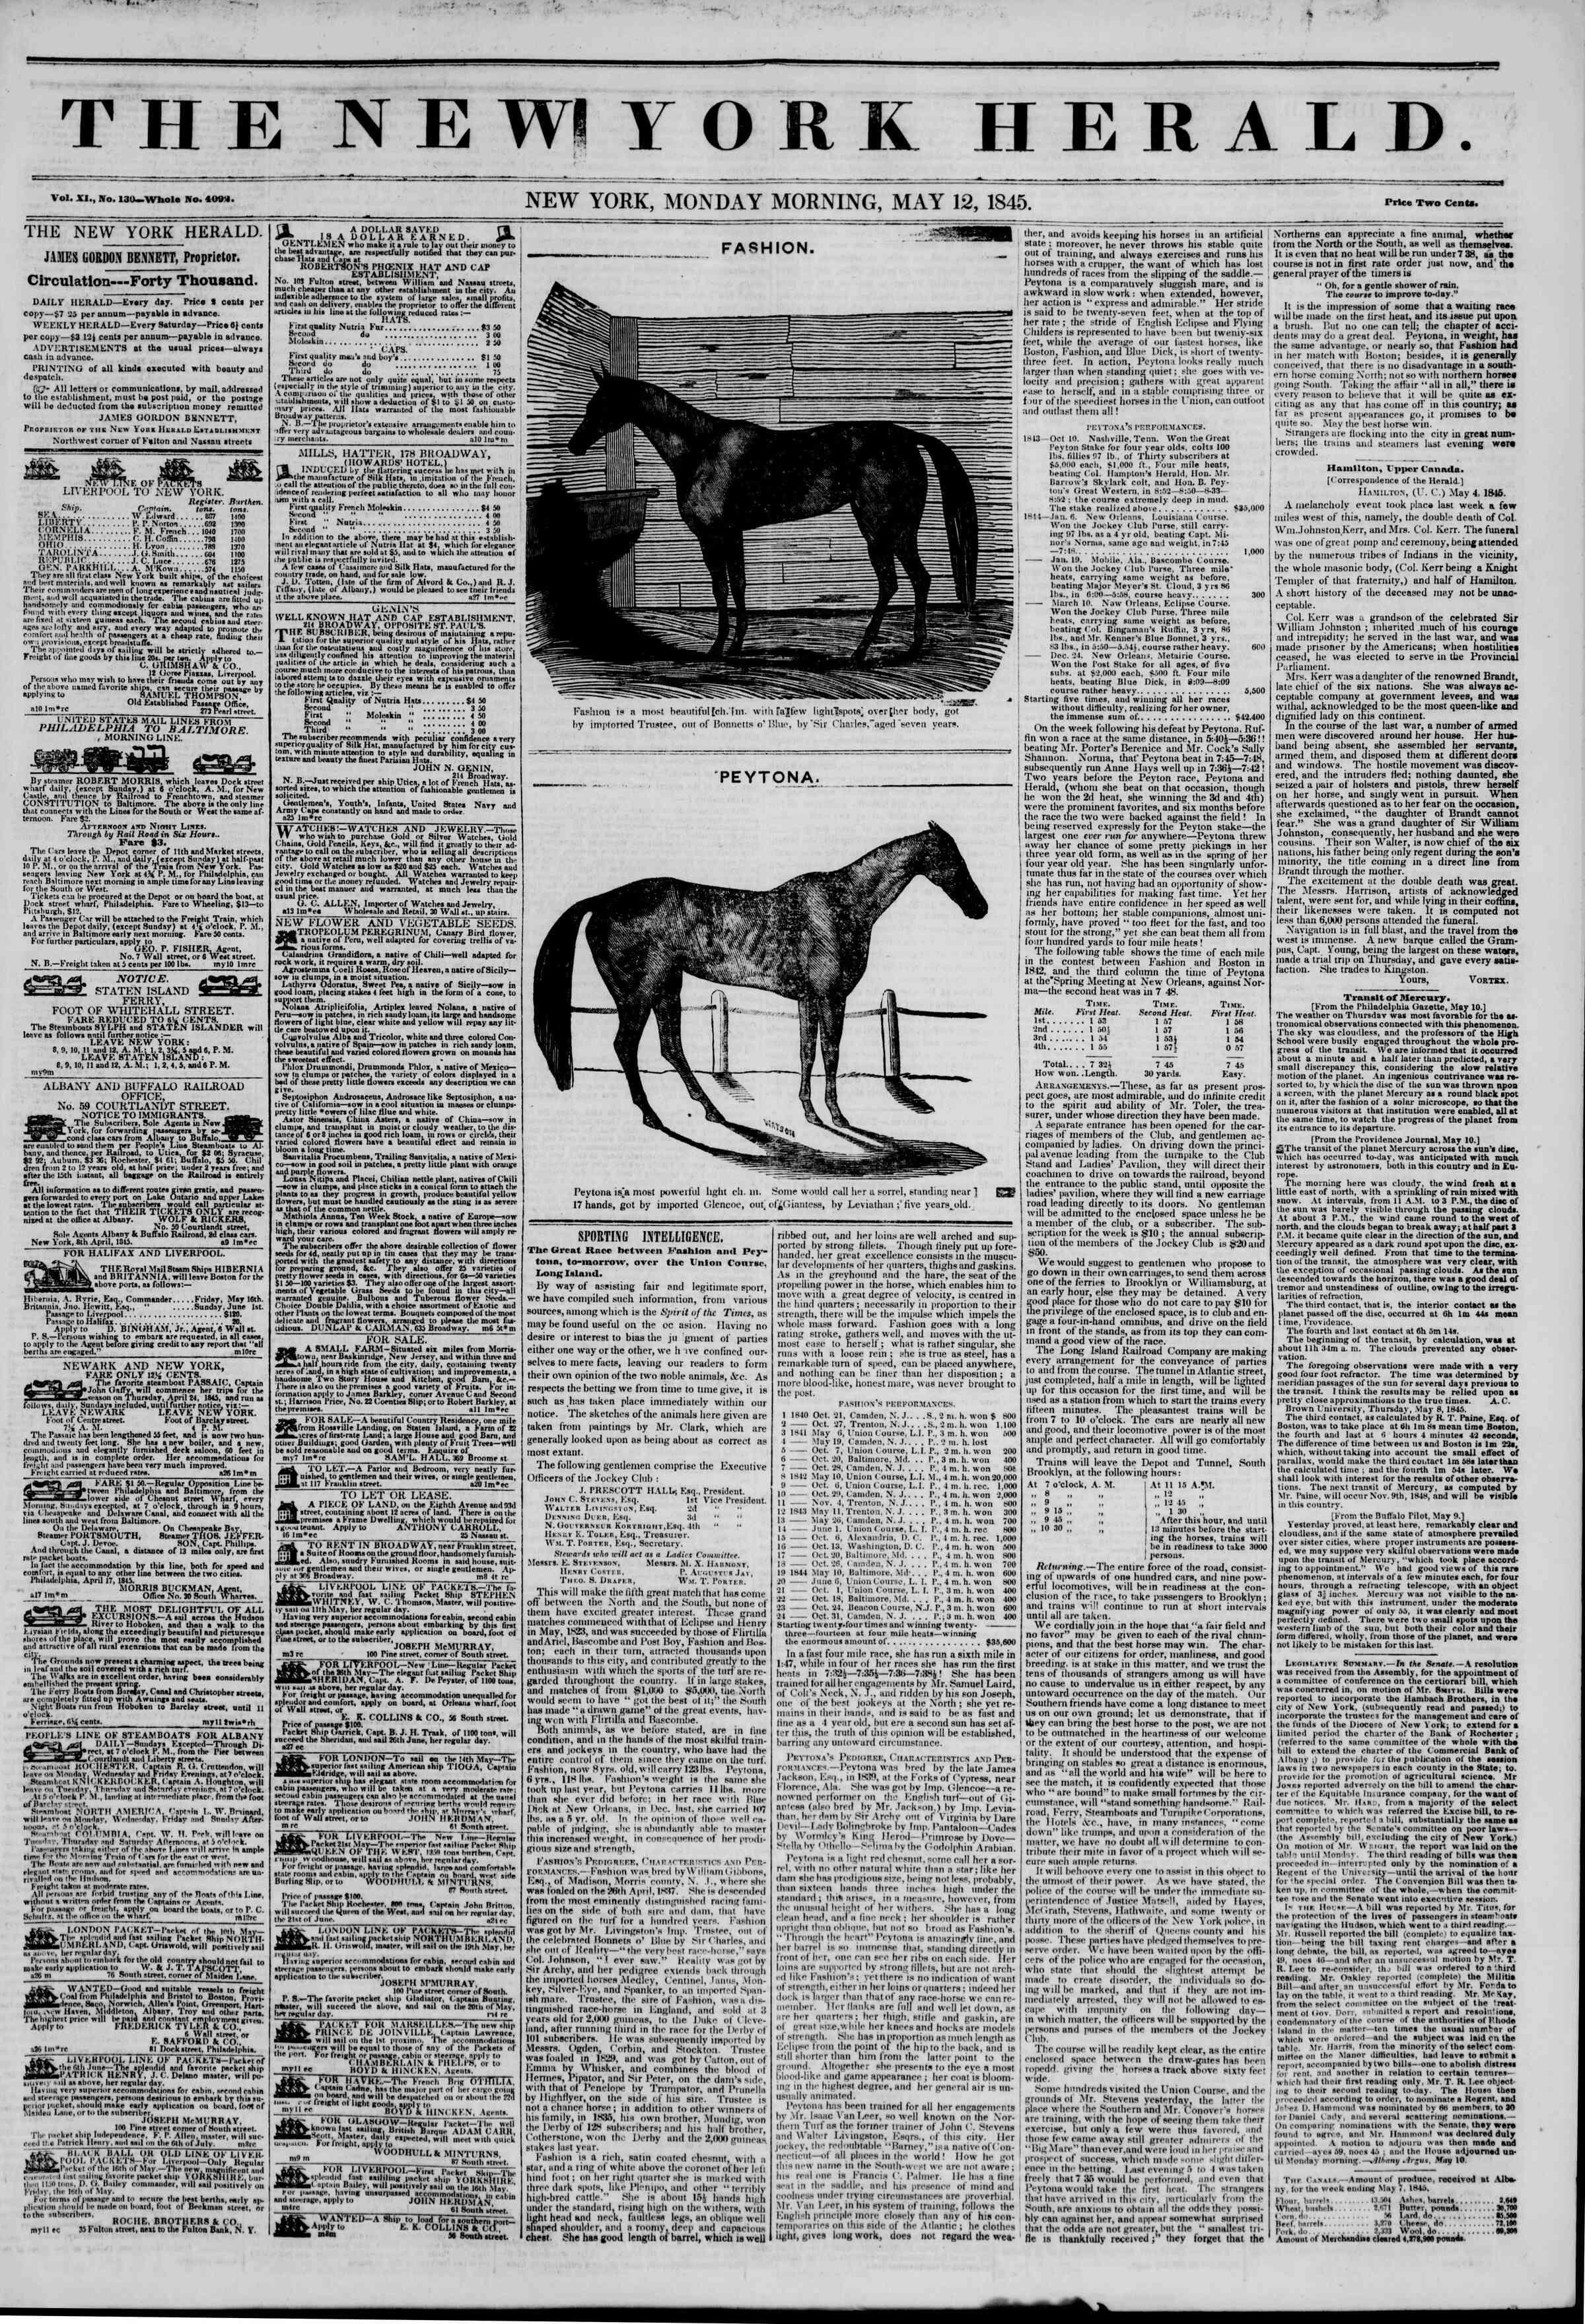 May 12, 1845 Tarihli The New York Herald Gazetesi Sayfa 1